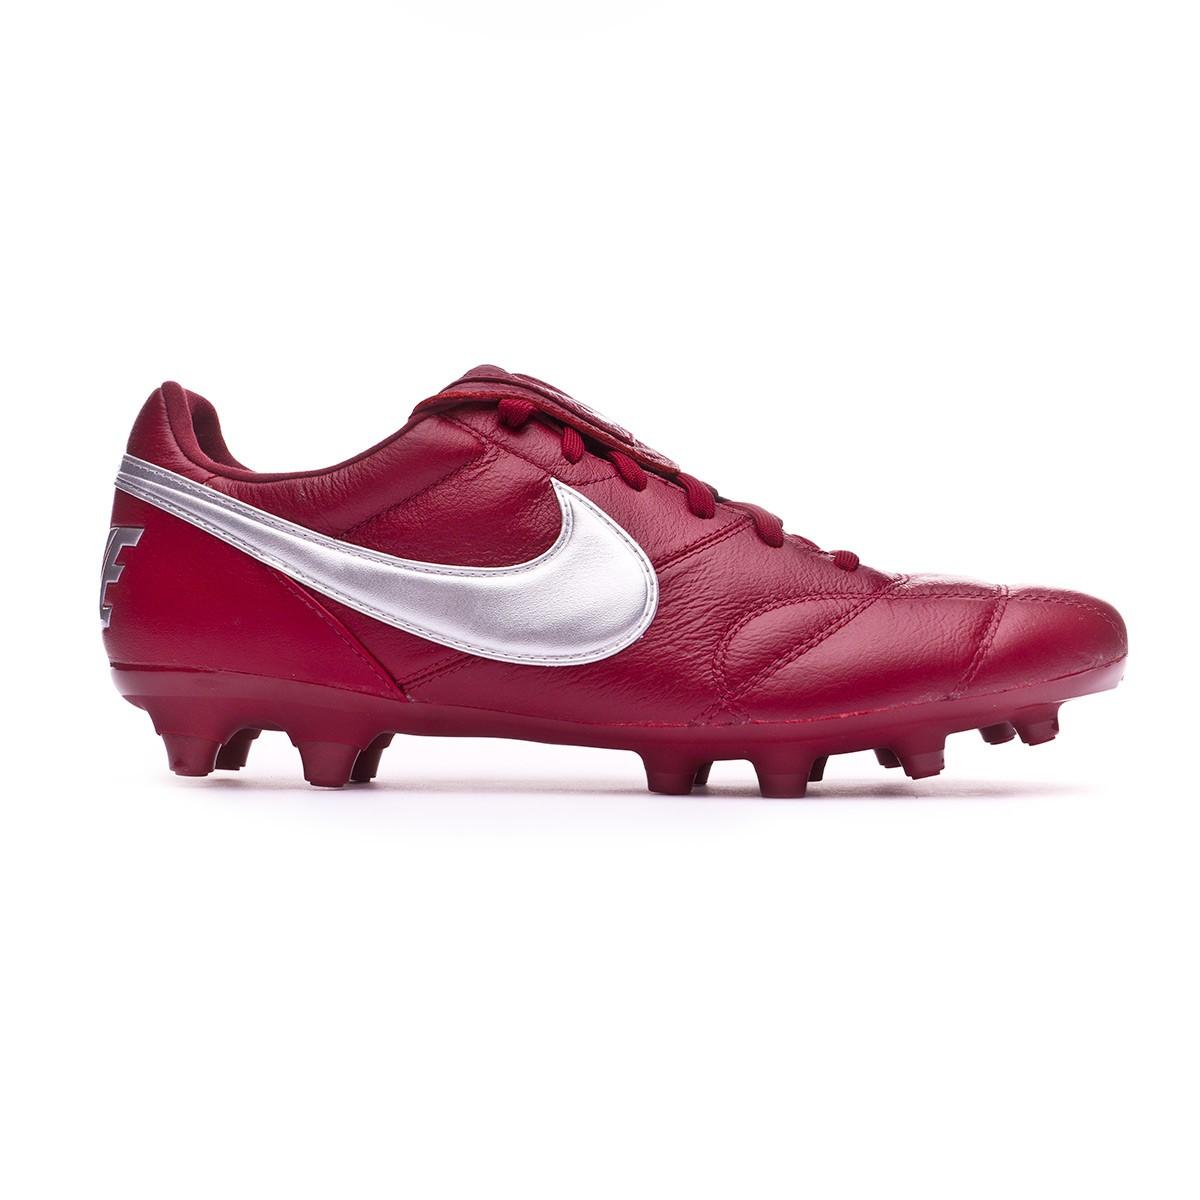 fcfd2ff43e16 Football Boots Nike Tiempo Premier II FG Team red-Metallic silver -  Football store Fútbol Emotion